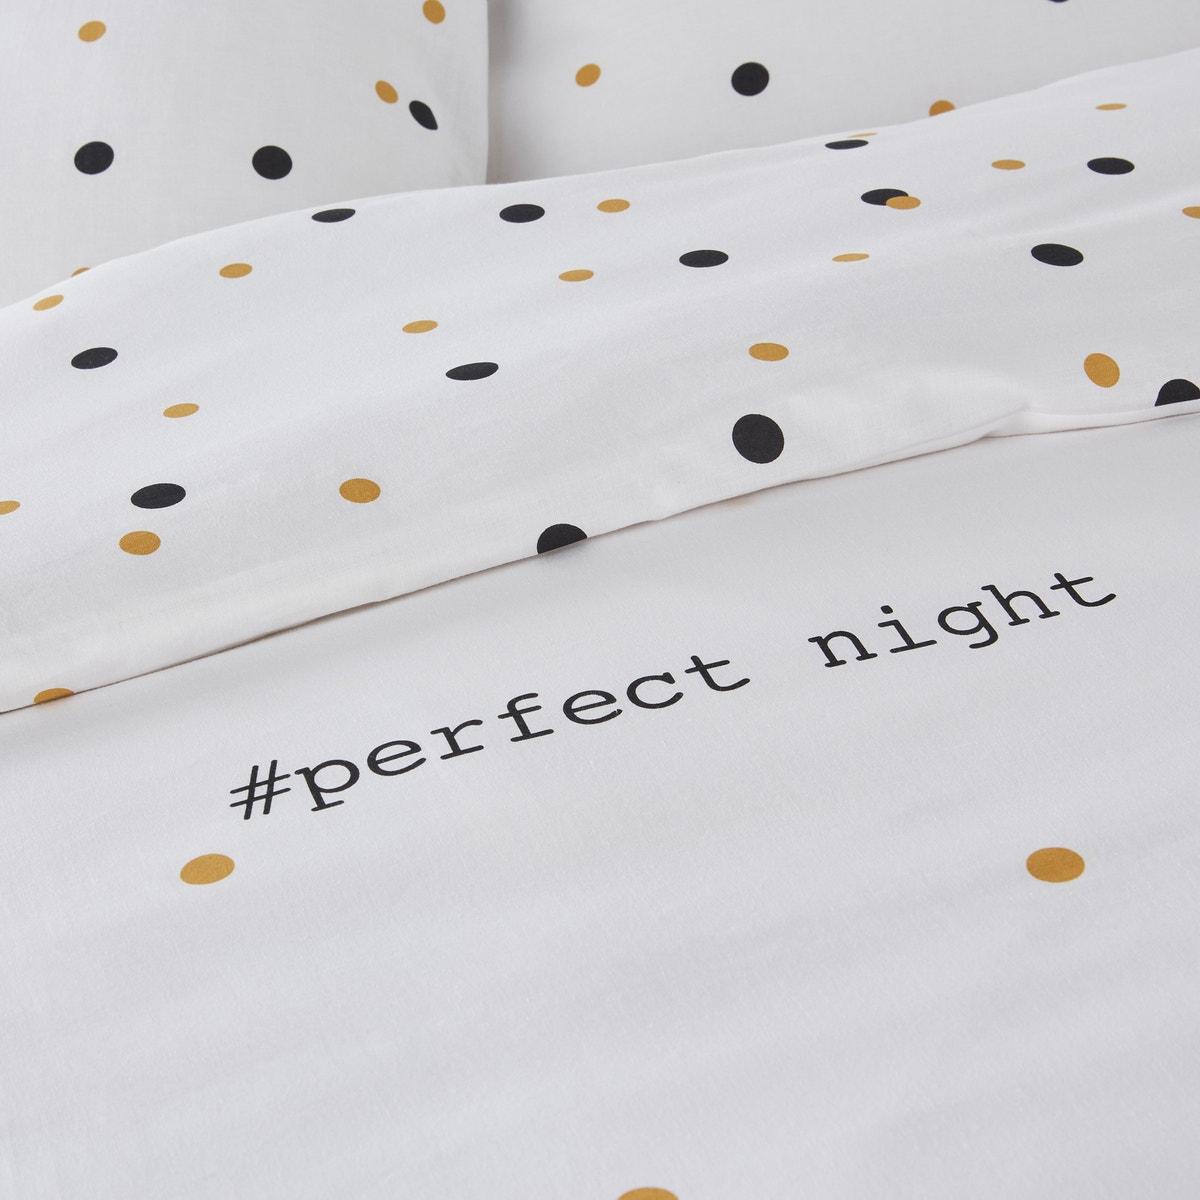 Perfect Night コットン プリント掛け布団カバー